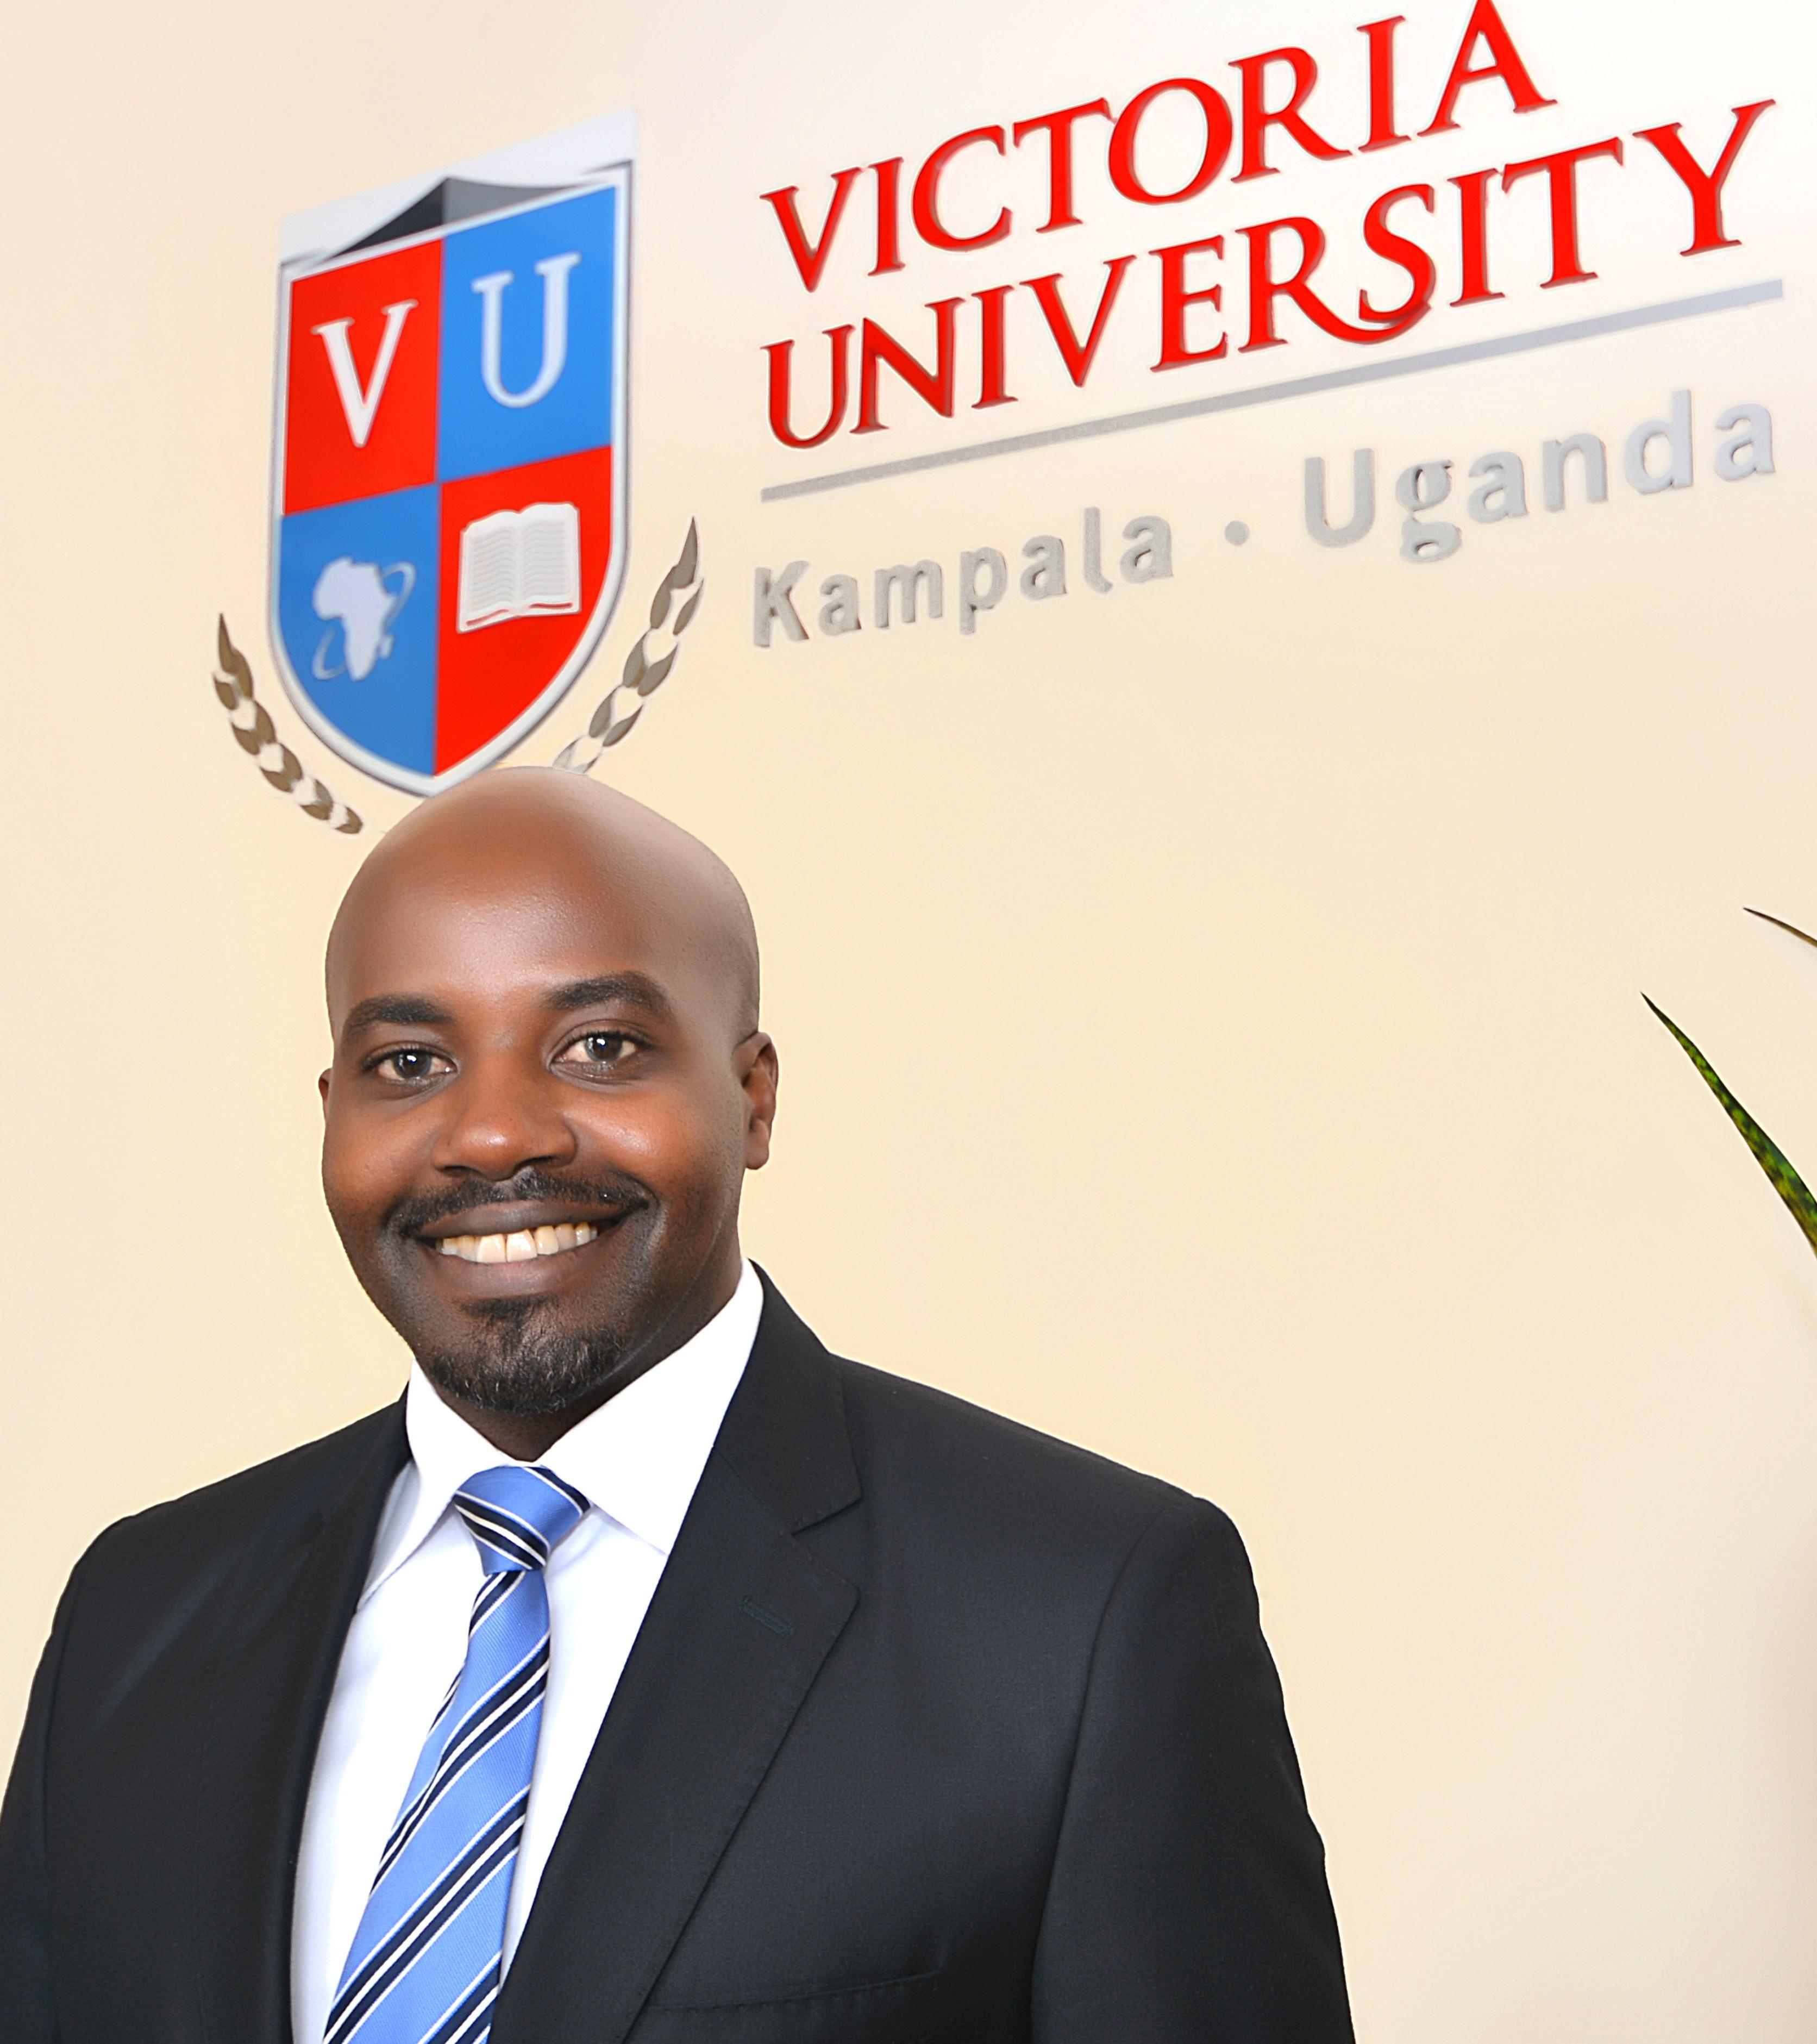 Oscar Kamukama, the marketing and recruitment specialist - Victoria University